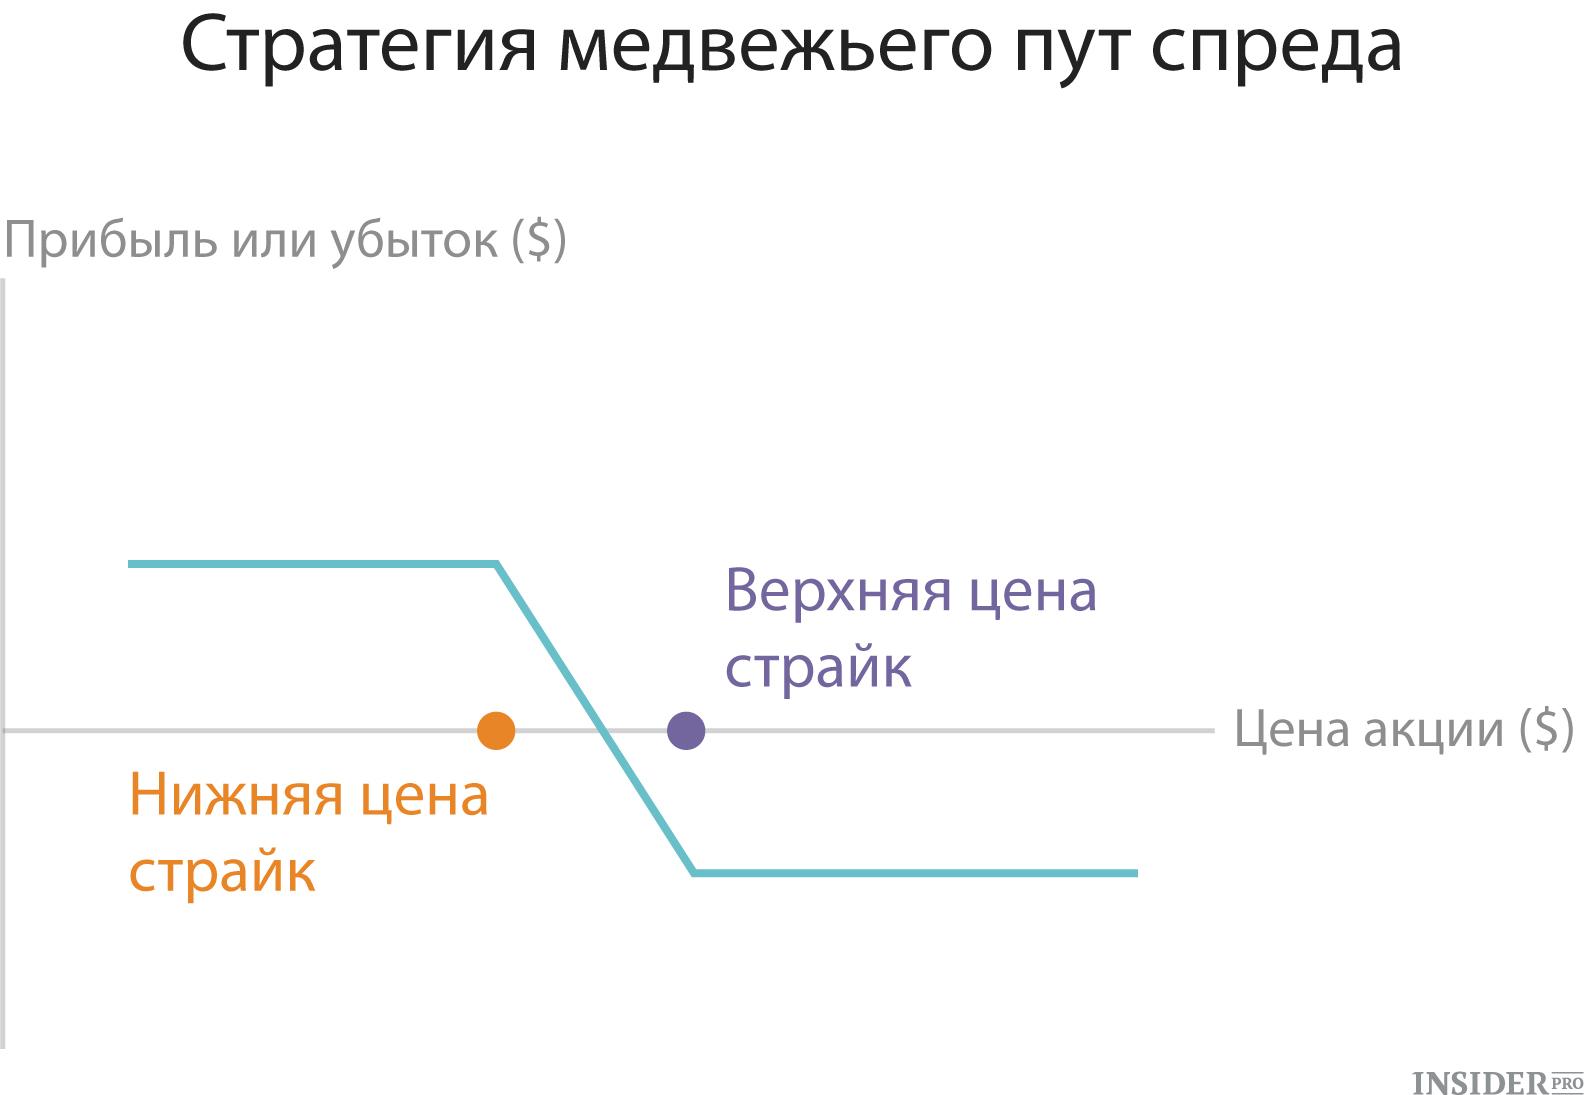 opcijas riska maksa)